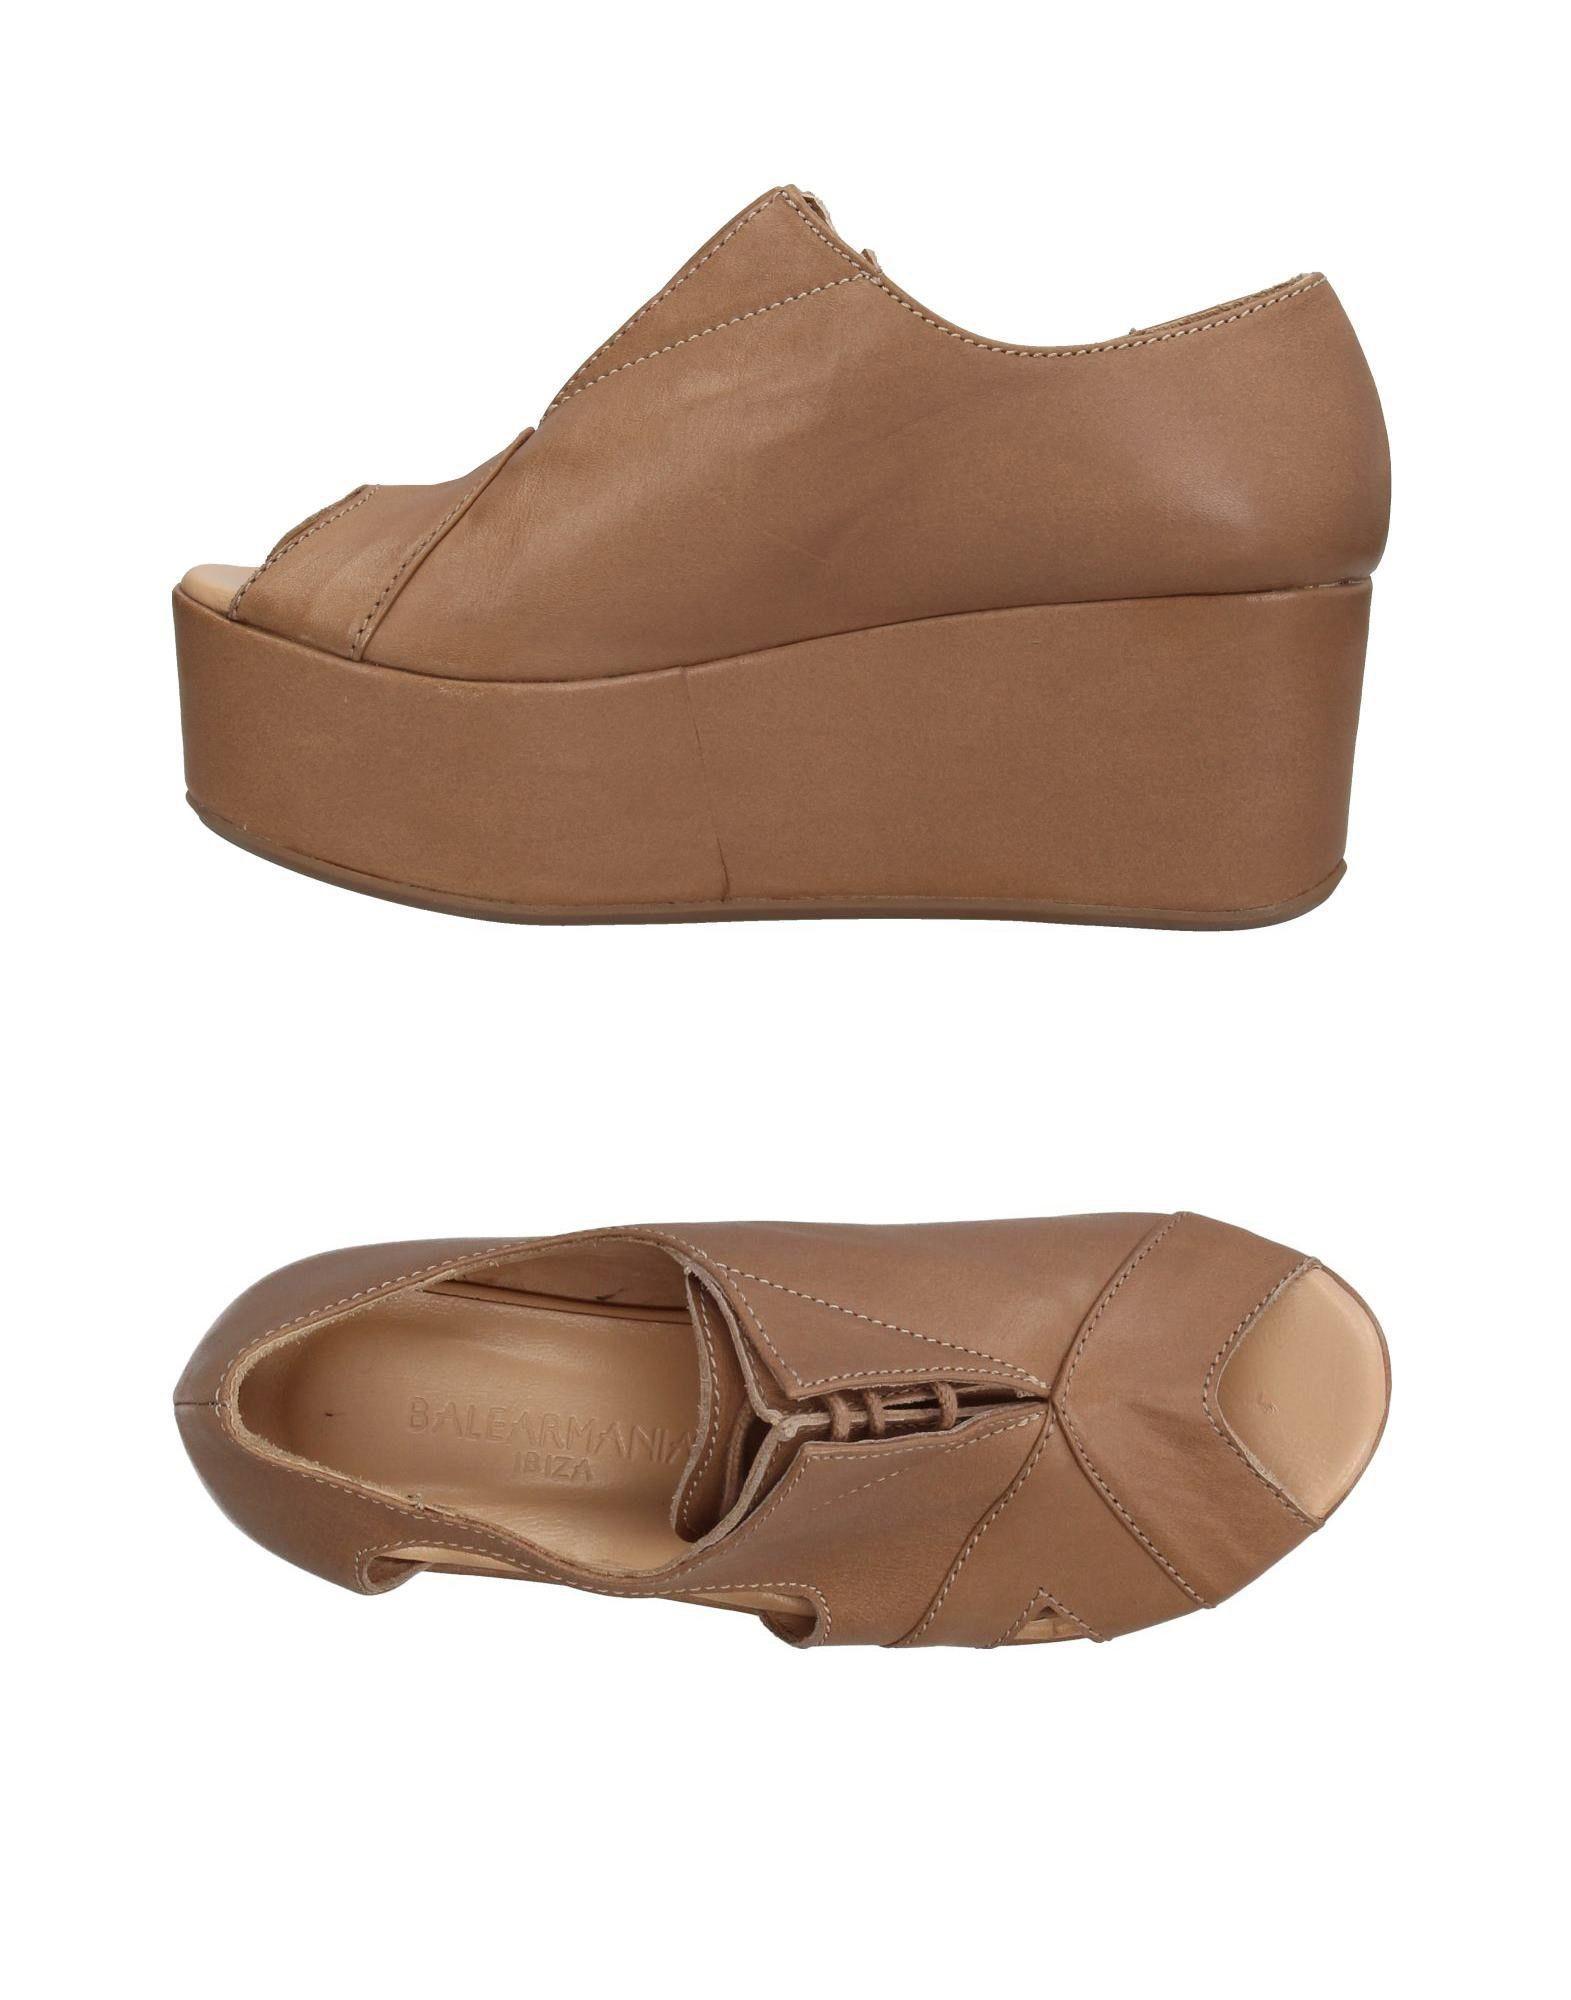 BALEAR MANIA Обувь на шнурках